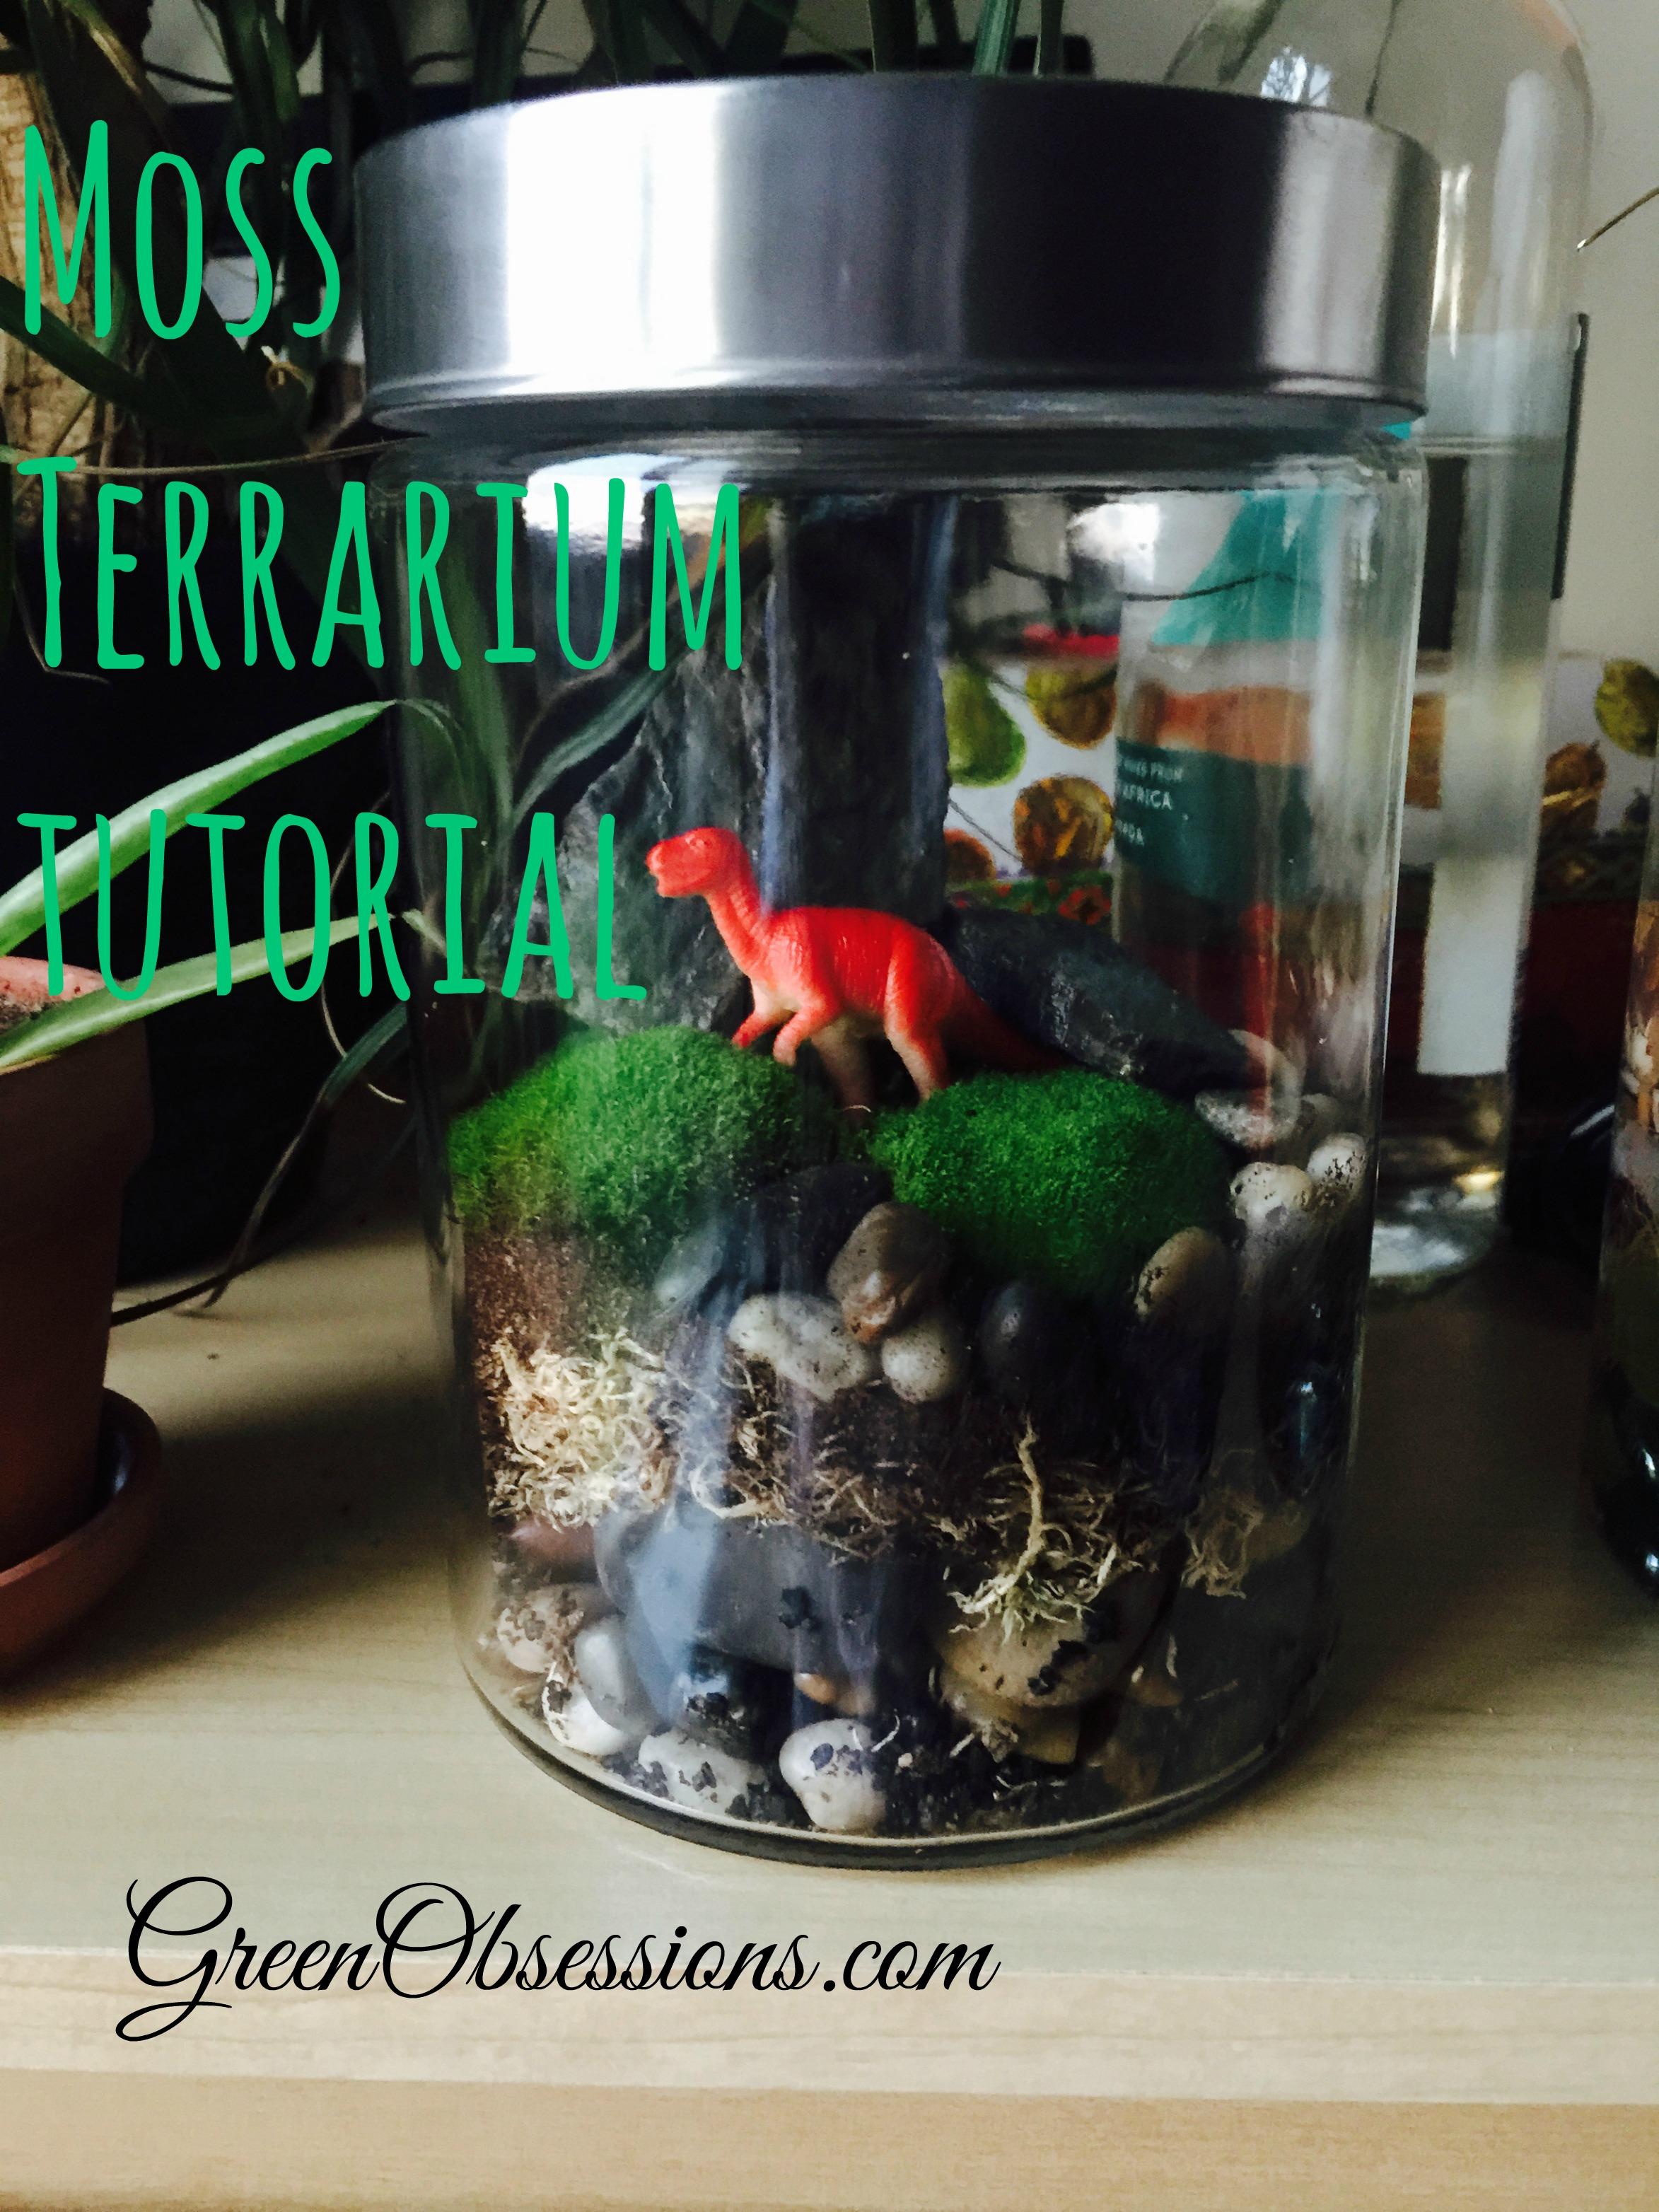 moss-terrarium